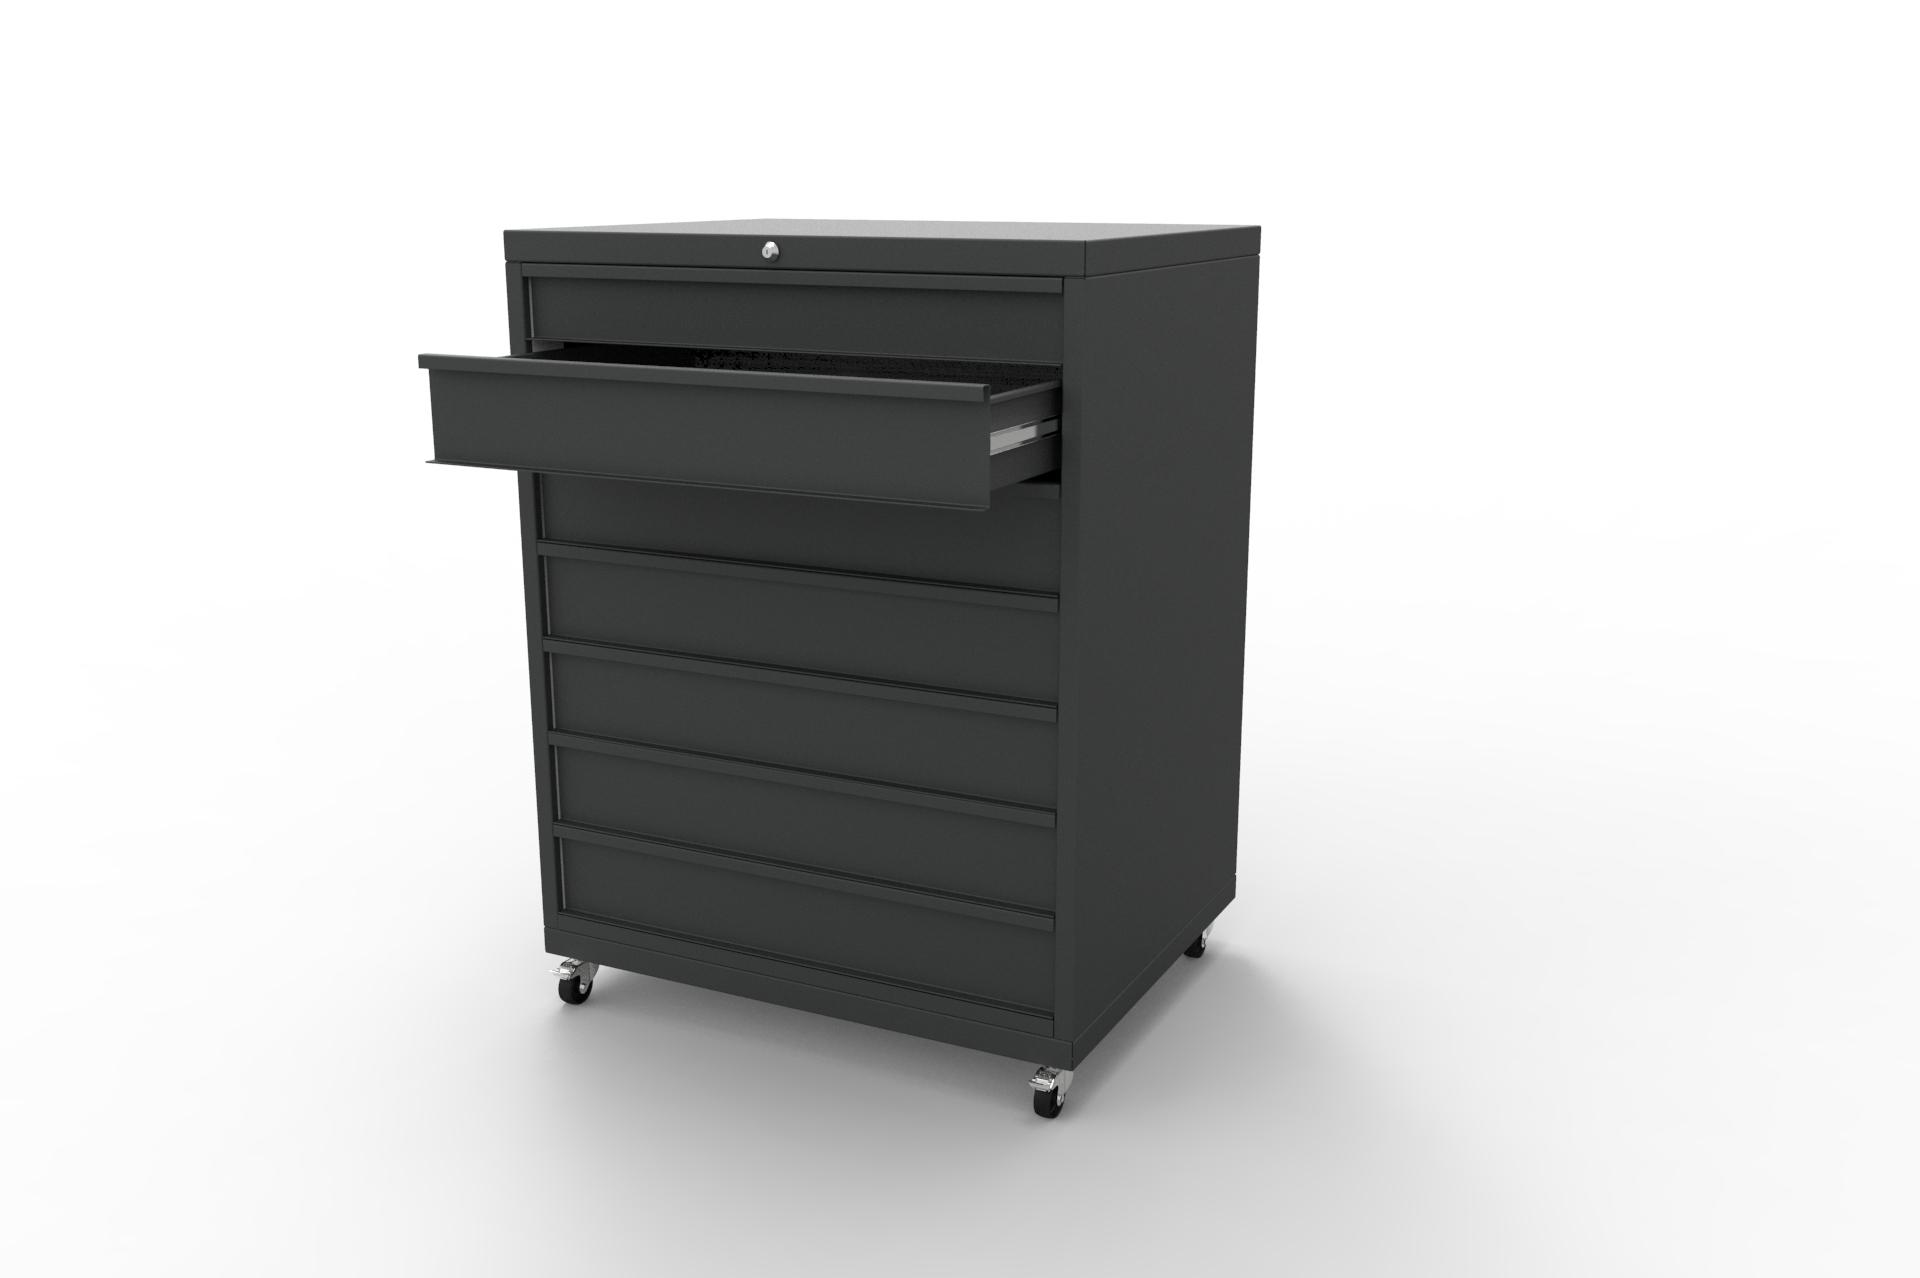 fabricant de tessonnier meuble tiroir en m tal fabricant meuble metal. Black Bedroom Furniture Sets. Home Design Ideas